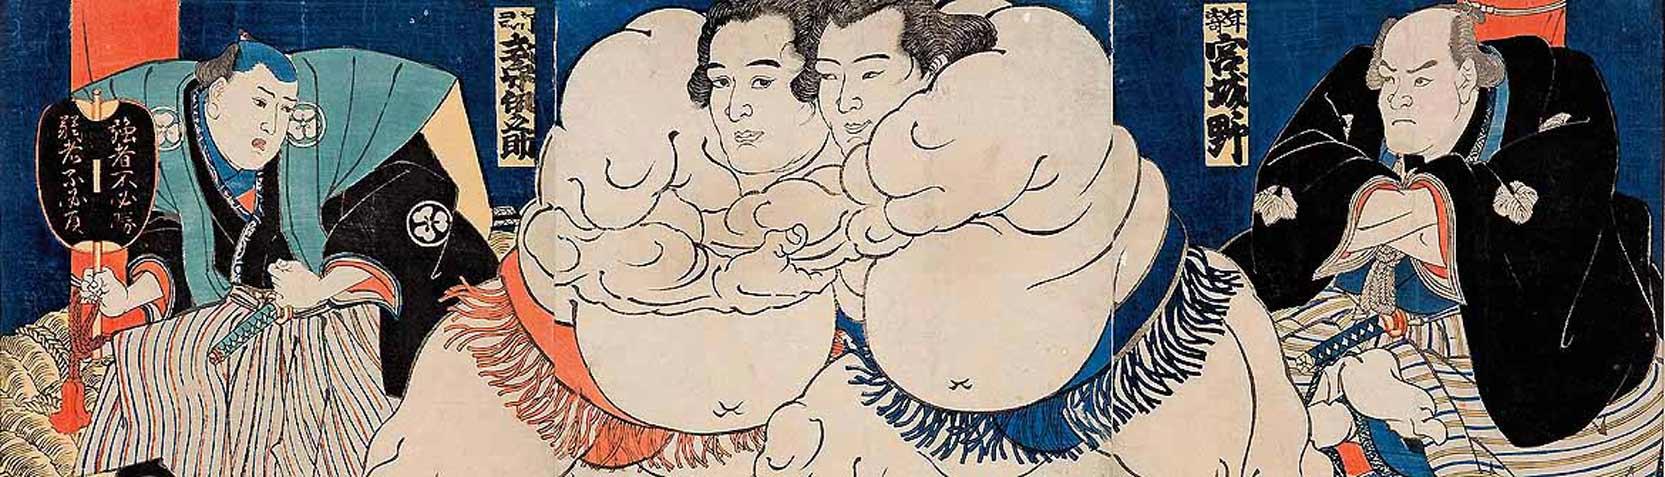 Artistas - Utagawa Kuniyoshi